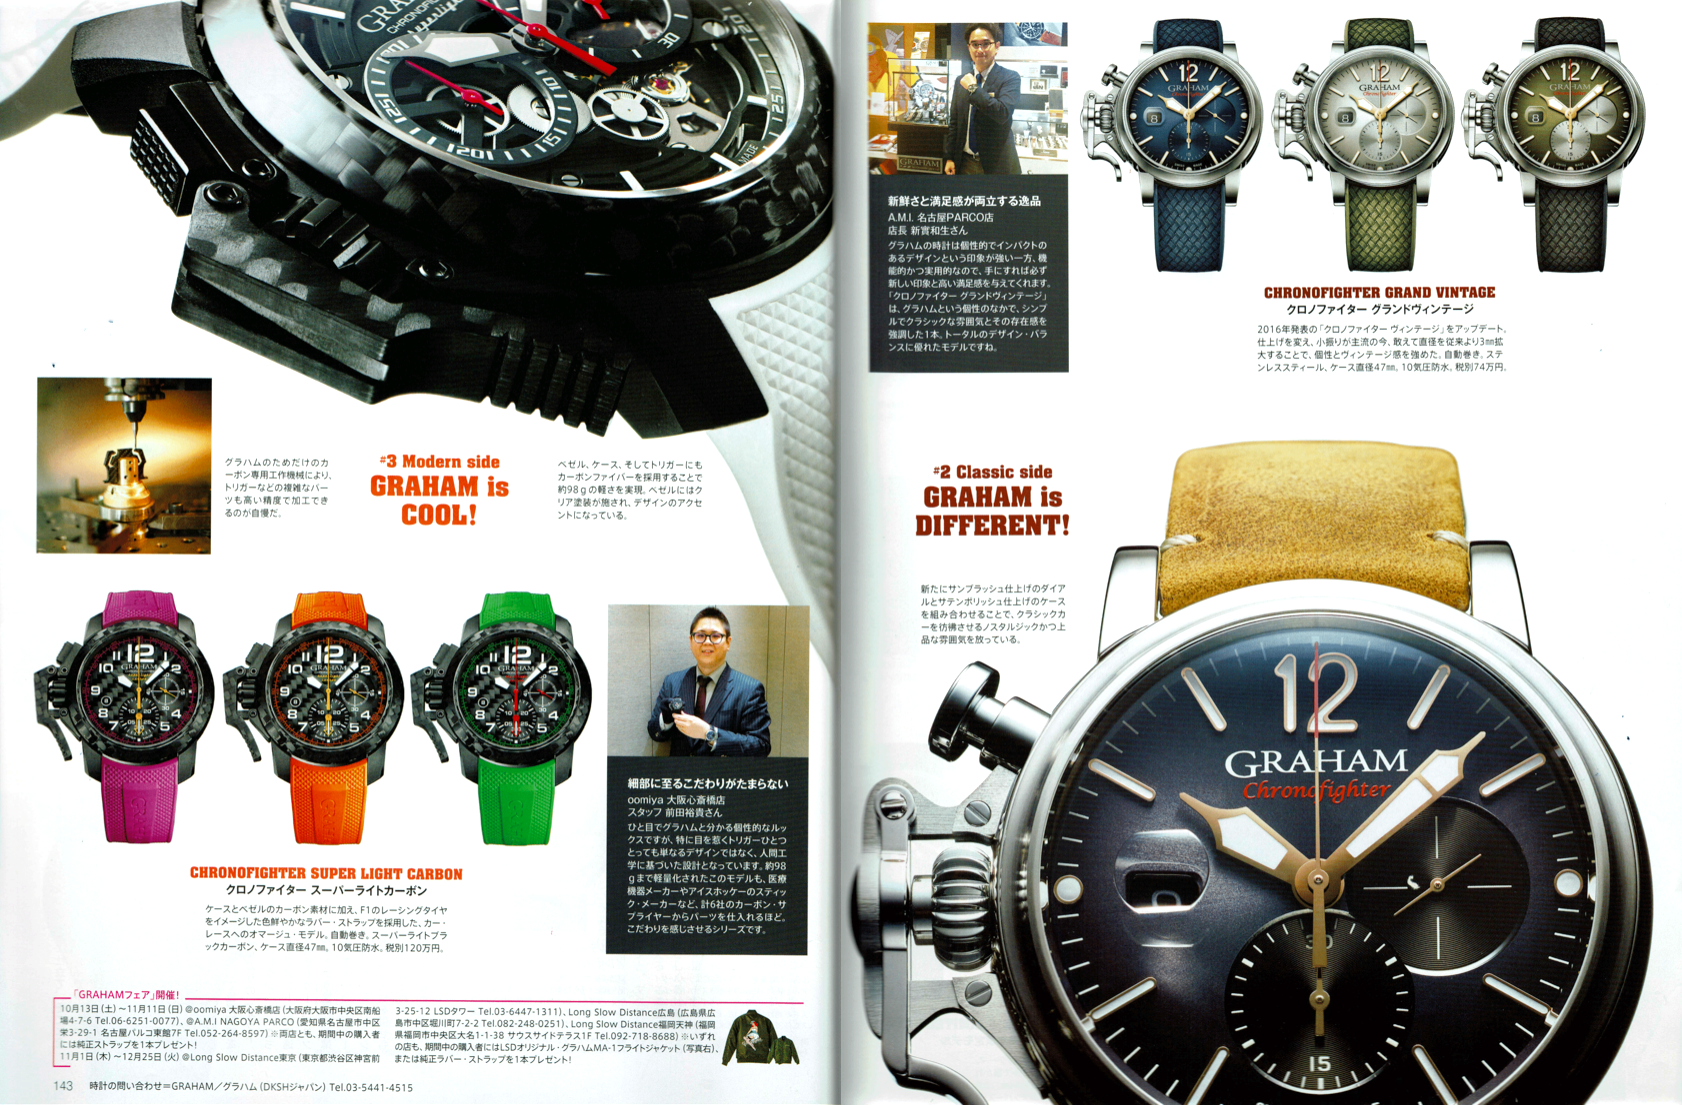 【GRAHAM グラハム】Chronofighter Vintage Nose Art Ltd クロノファイターヴィンテージ ノーズアート『Linda リンダ』世界限定100本/国内正規品 腕時計